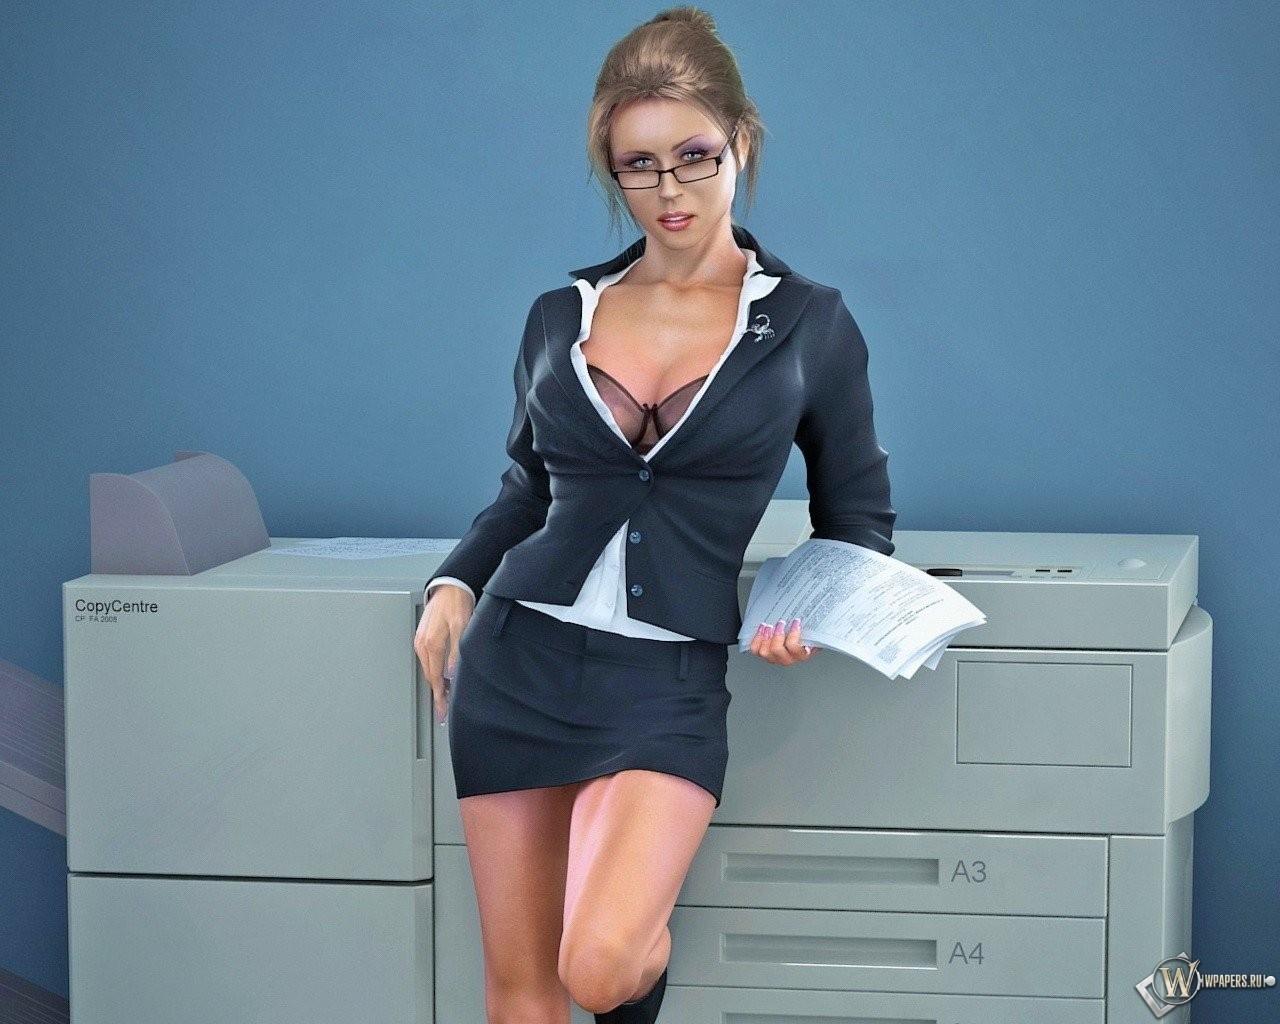 3D соблазнительная секретарша 1280x1024